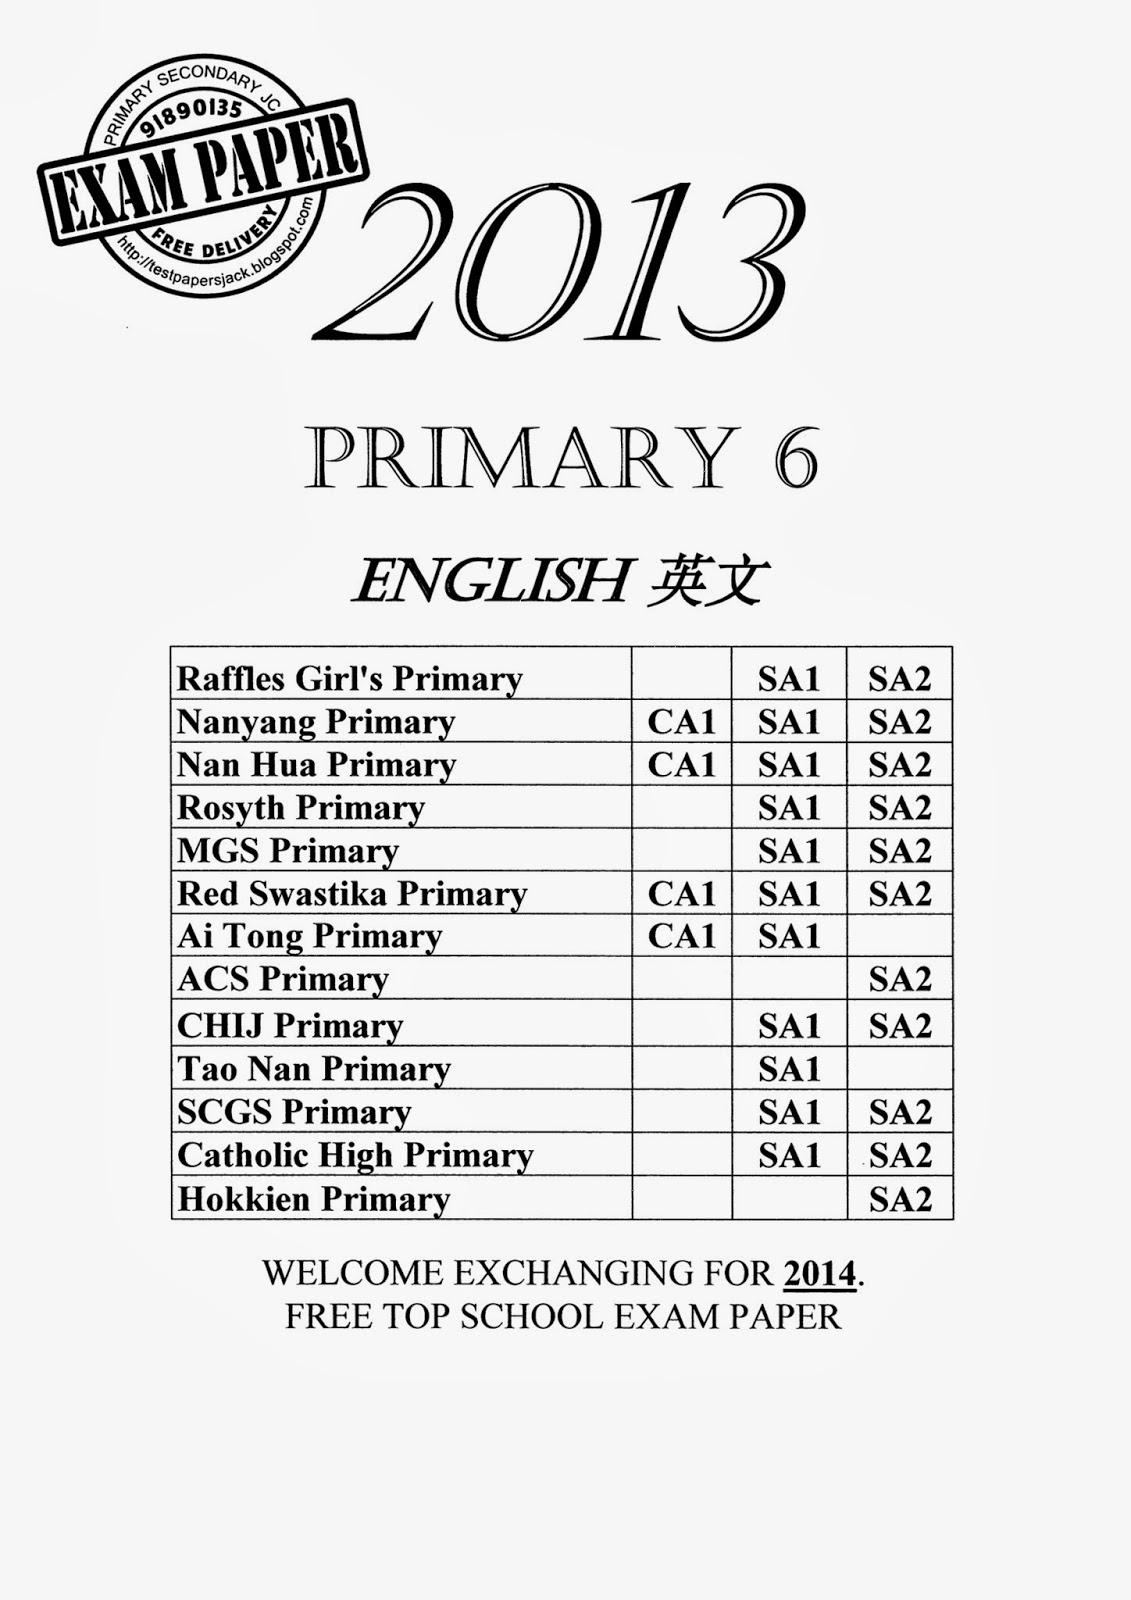 Exam Paper EXAM PAPER Exam Paper